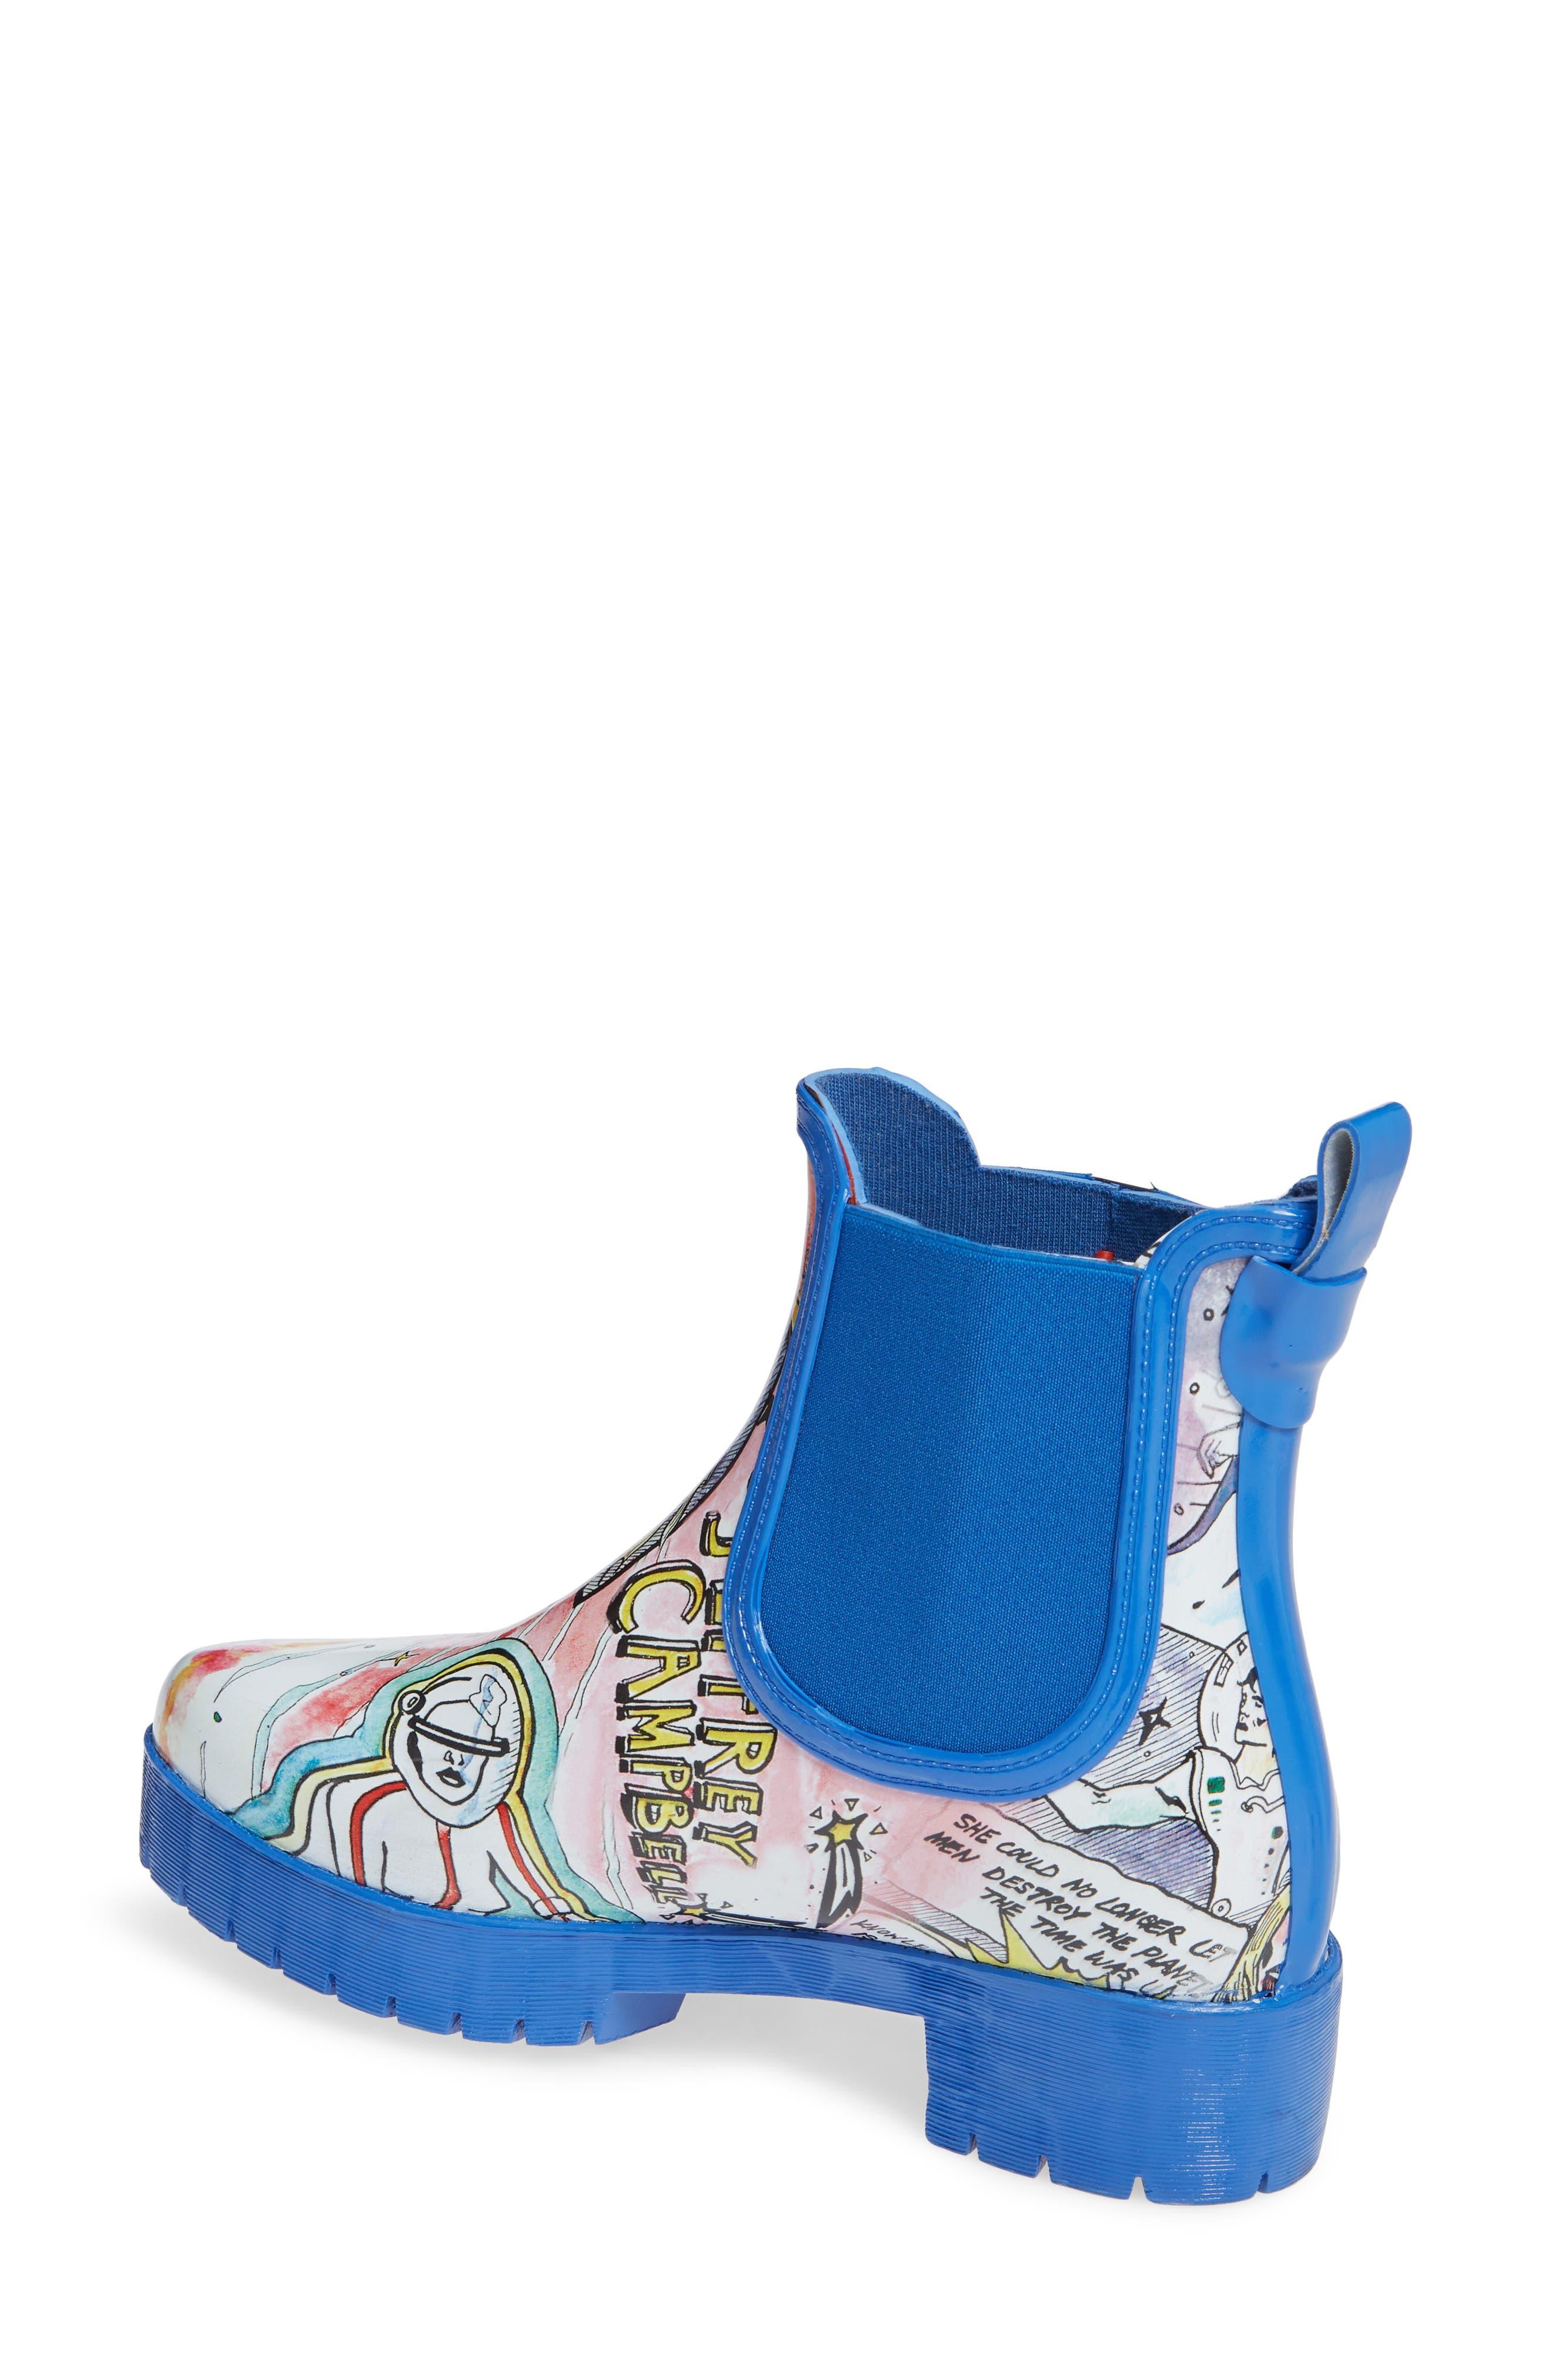 Cloudy Chelsea Rain Boot,                             Alternate thumbnail 2, color,                             COMIC PRINT